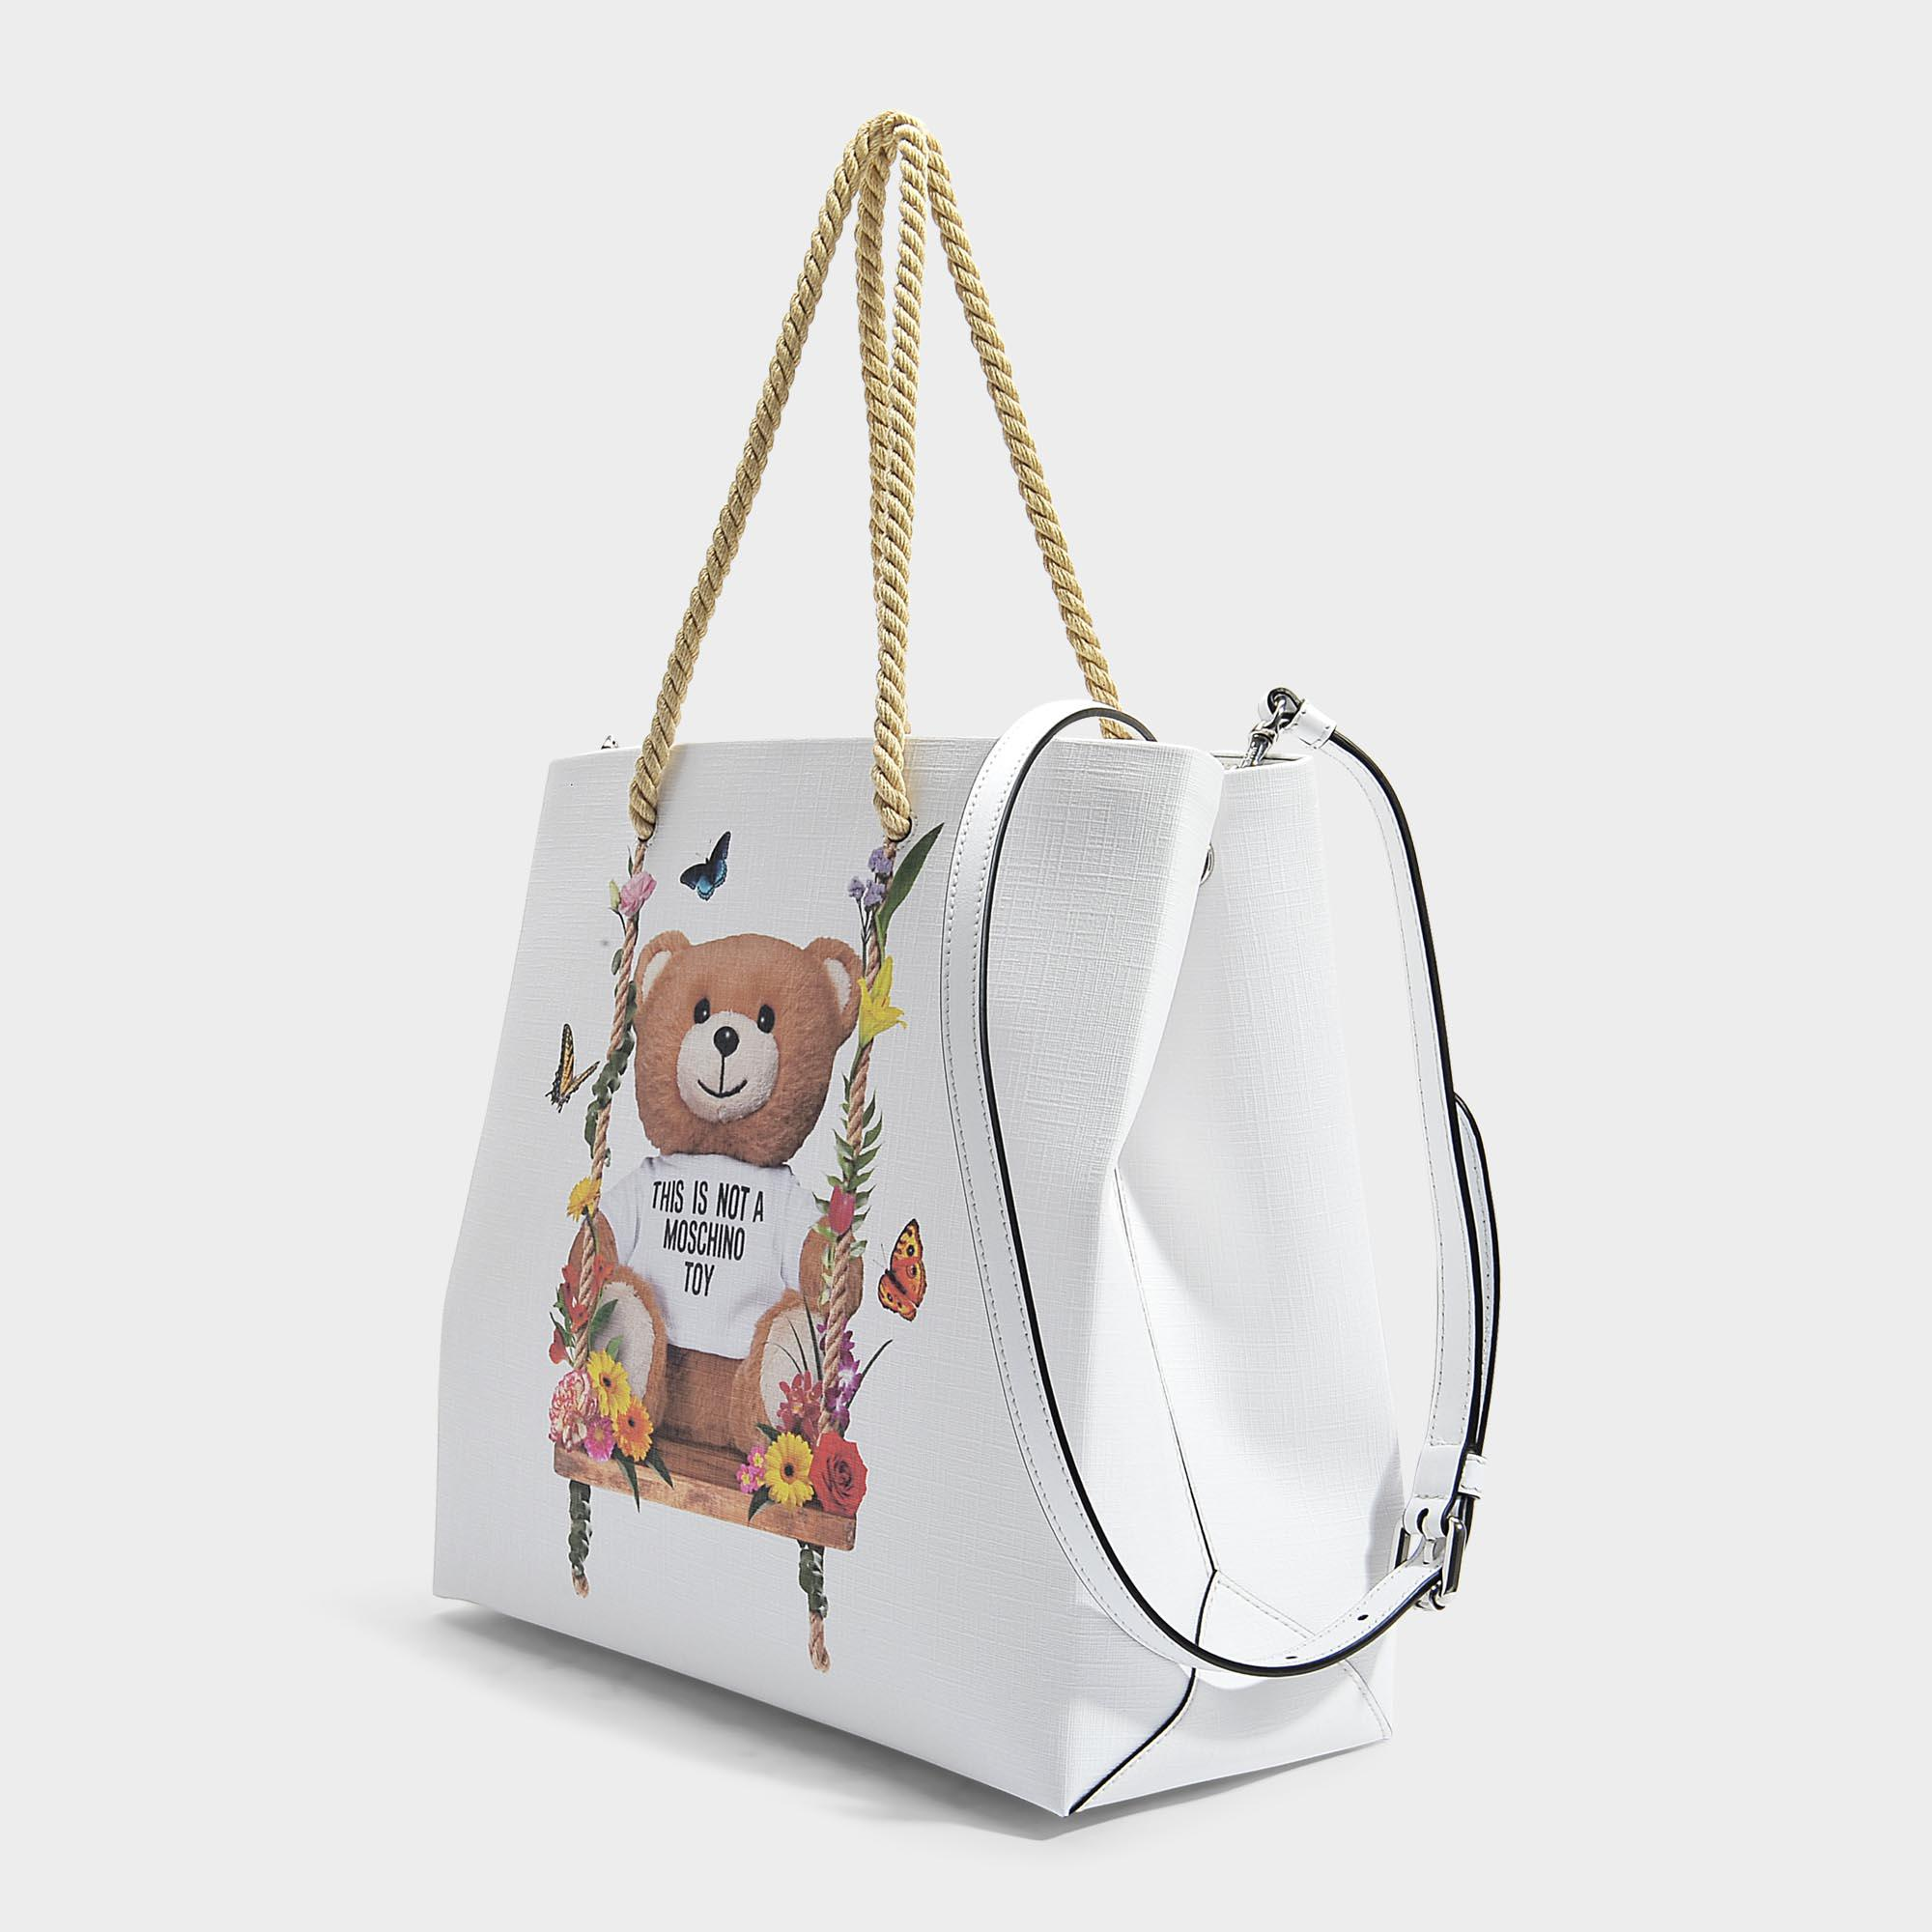 Teddy Shoulder Bag in Pink Calfskin Moschino R9EIeh